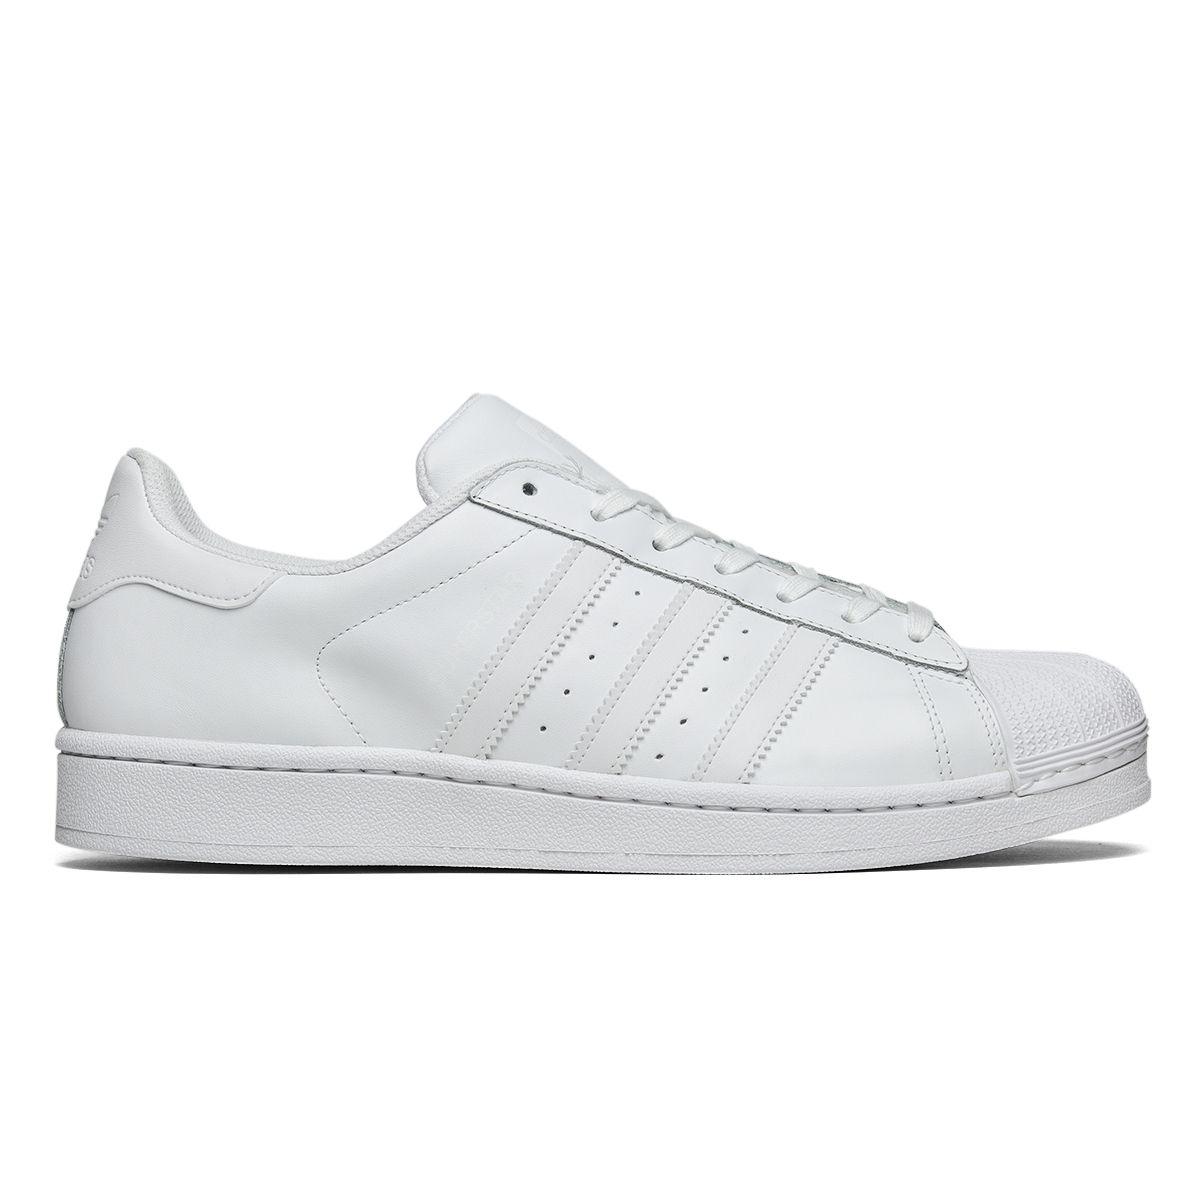 Tênis Adidas Superstar Foundation Branco  7db2805dbe5